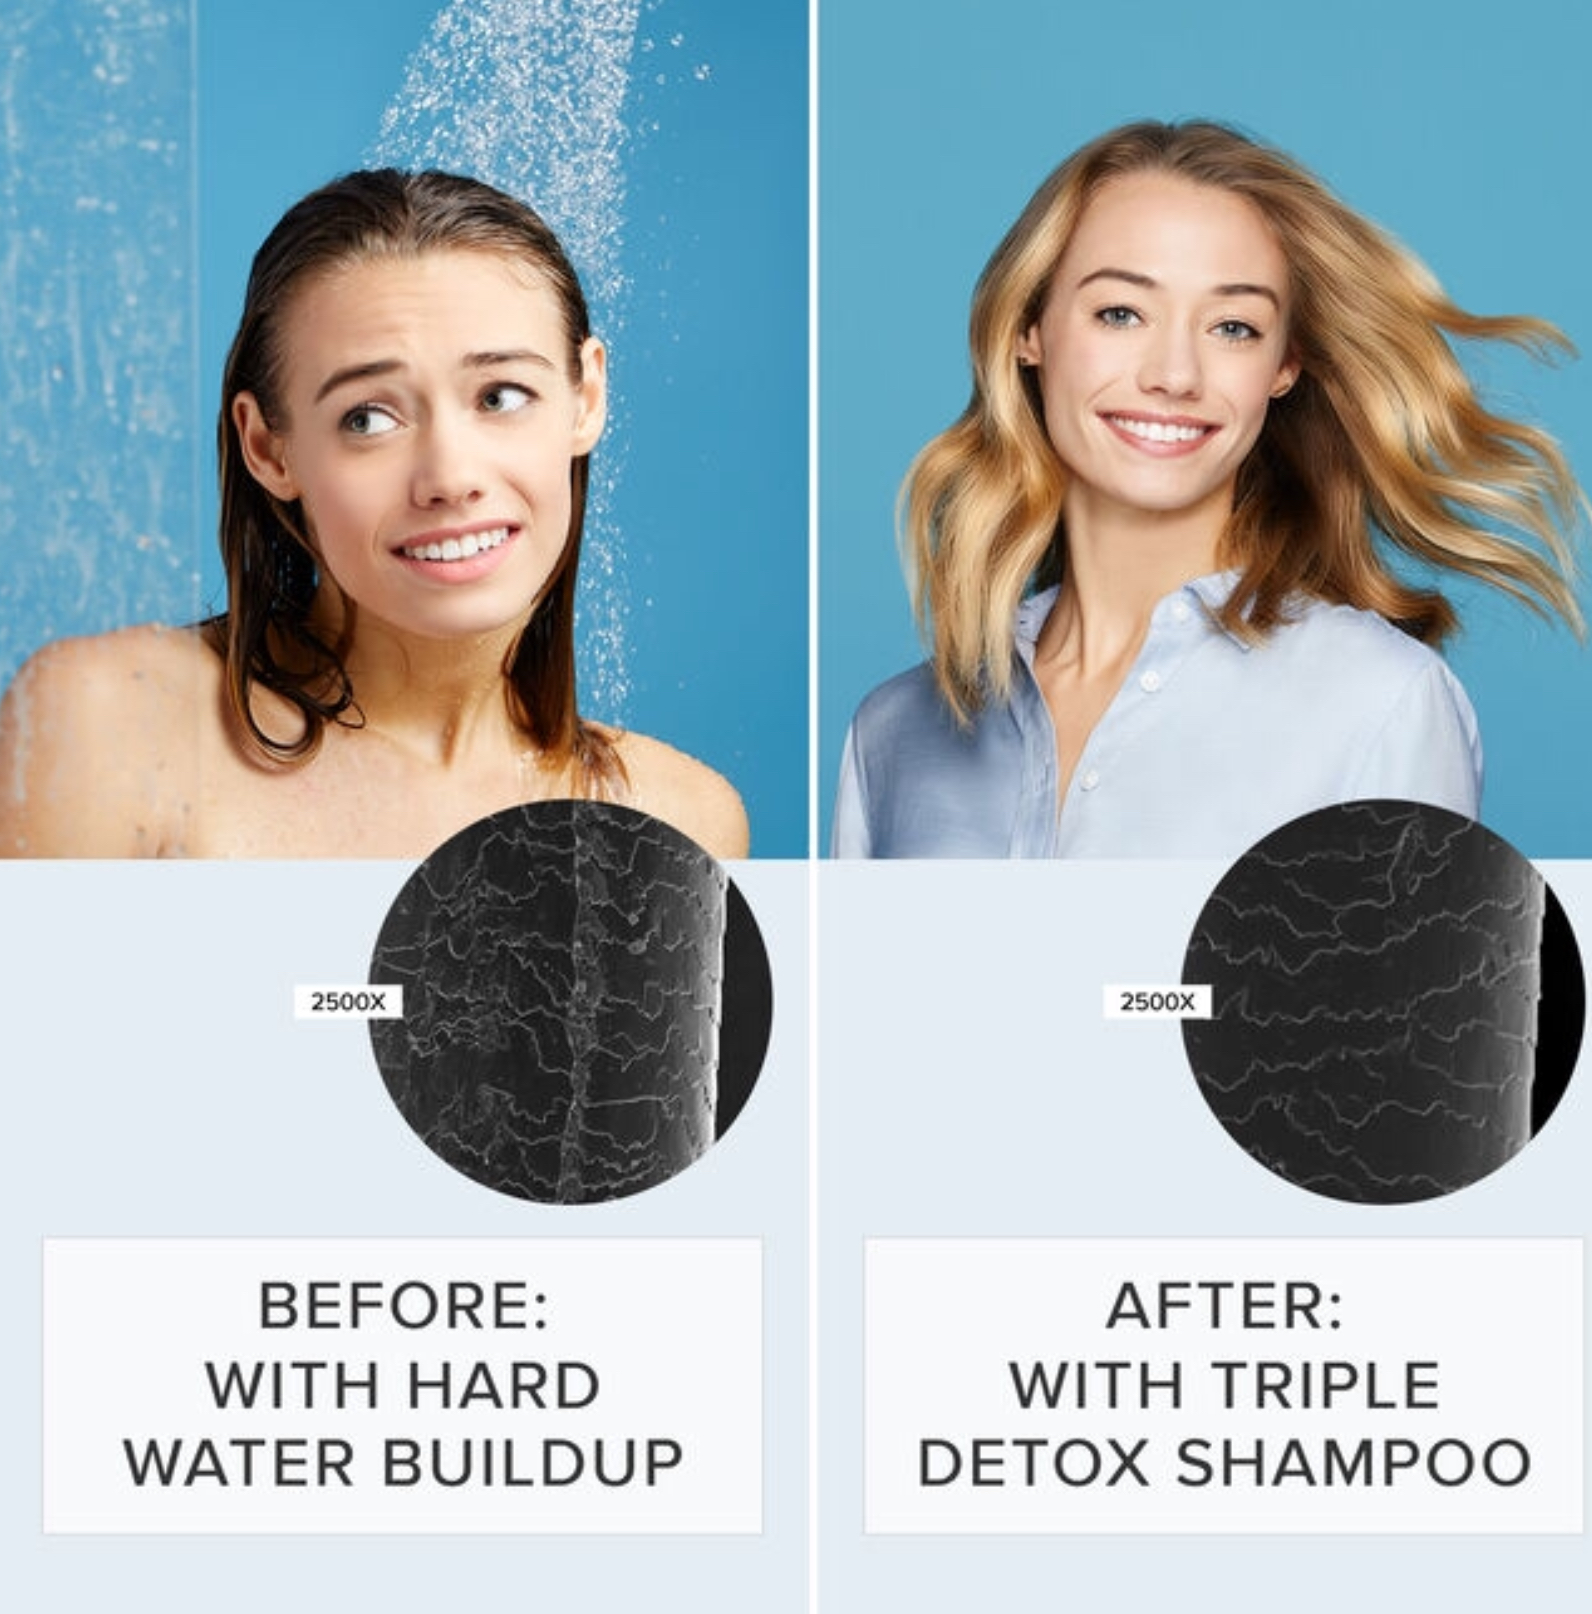 Trippel Detox Shampoo